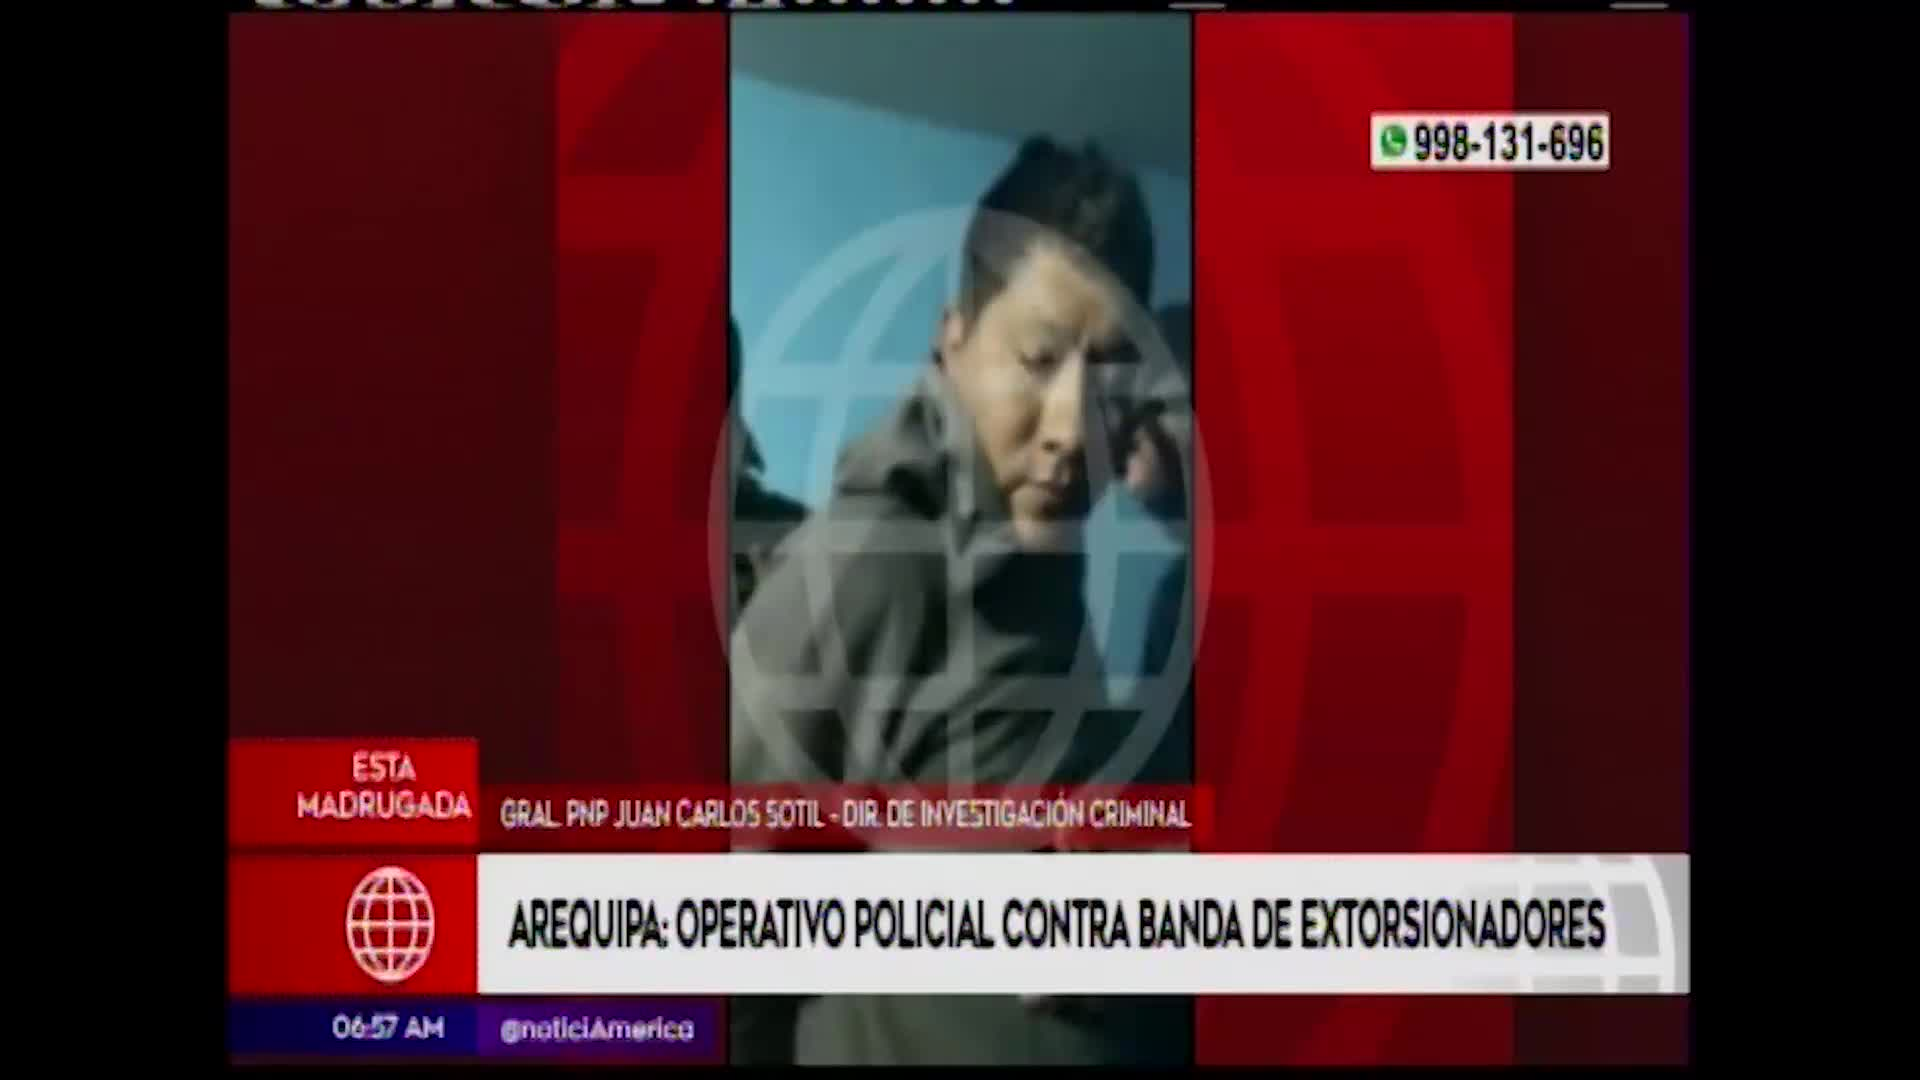 Arequipa: Policía capturó a 16 extorsionadores en megaoperativo